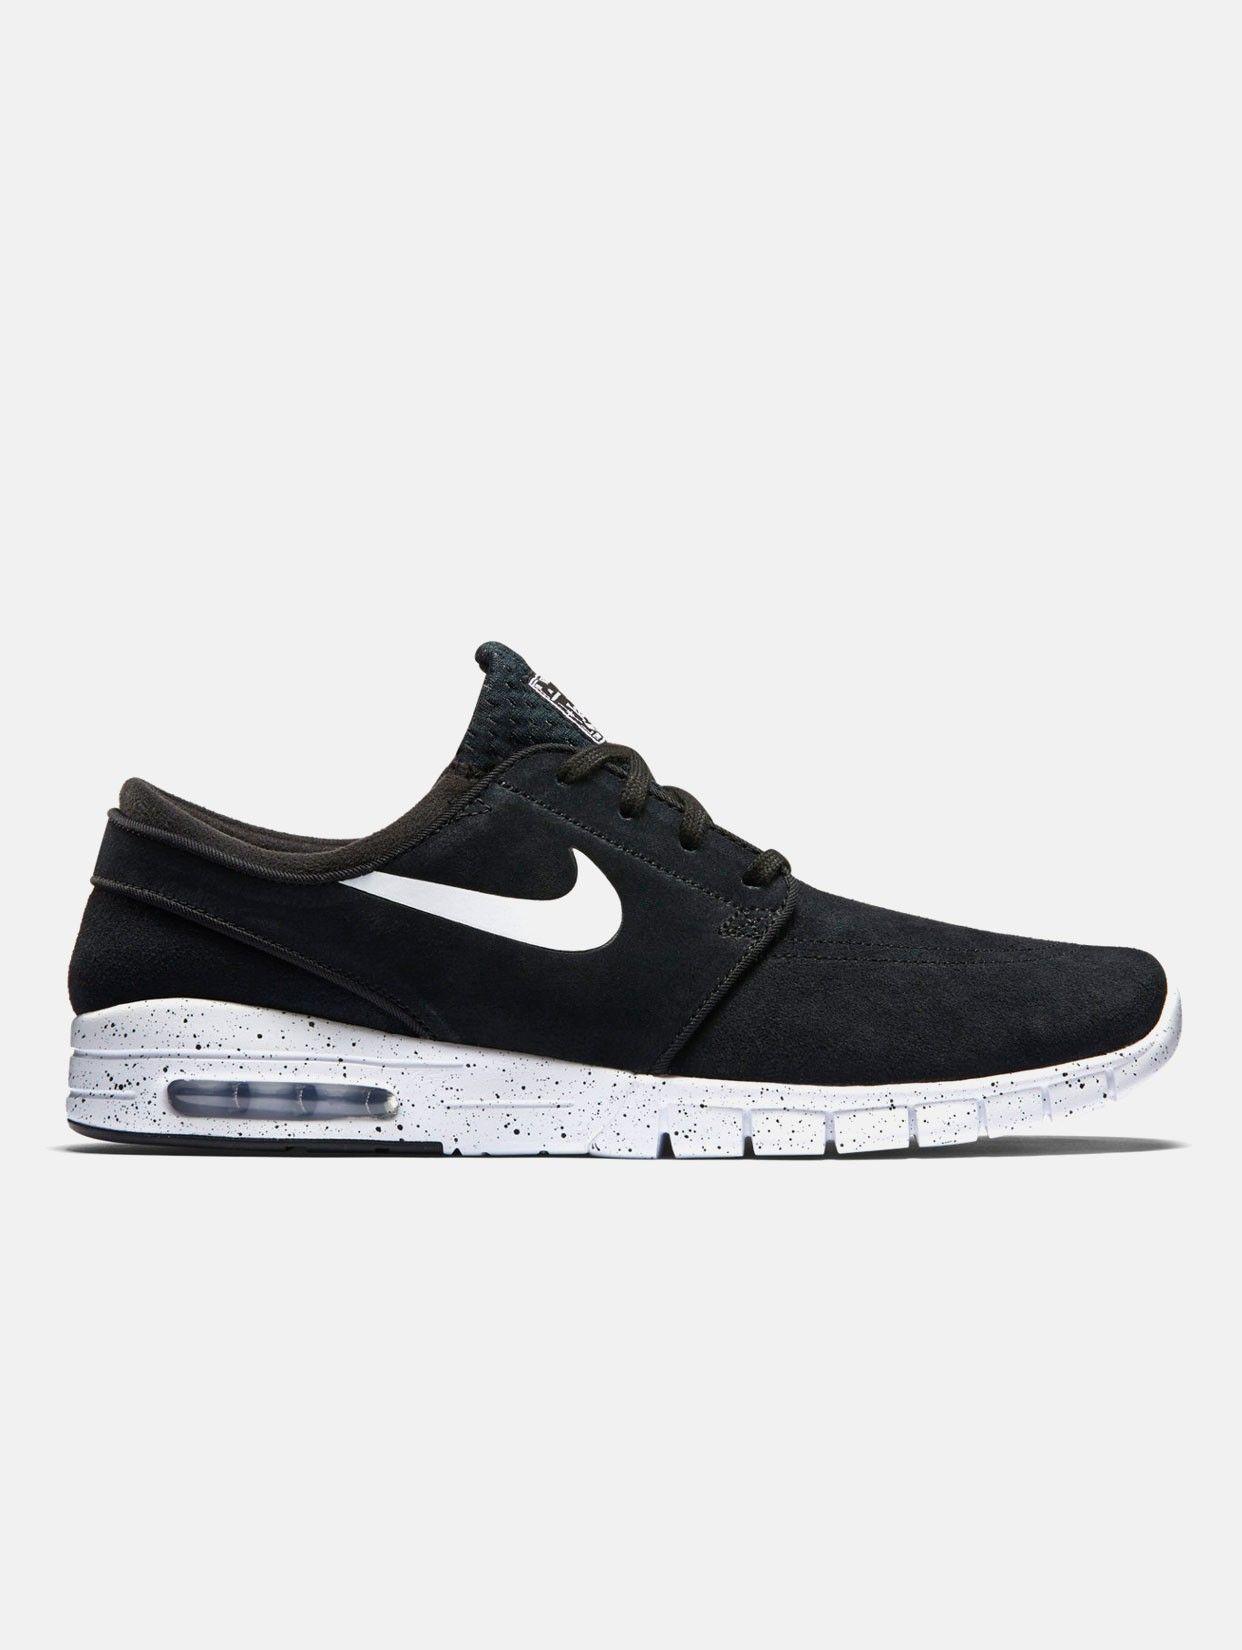 ec92cd7a61dd Nike SB Stefan Janoski Max L Suede Black White - Rollin